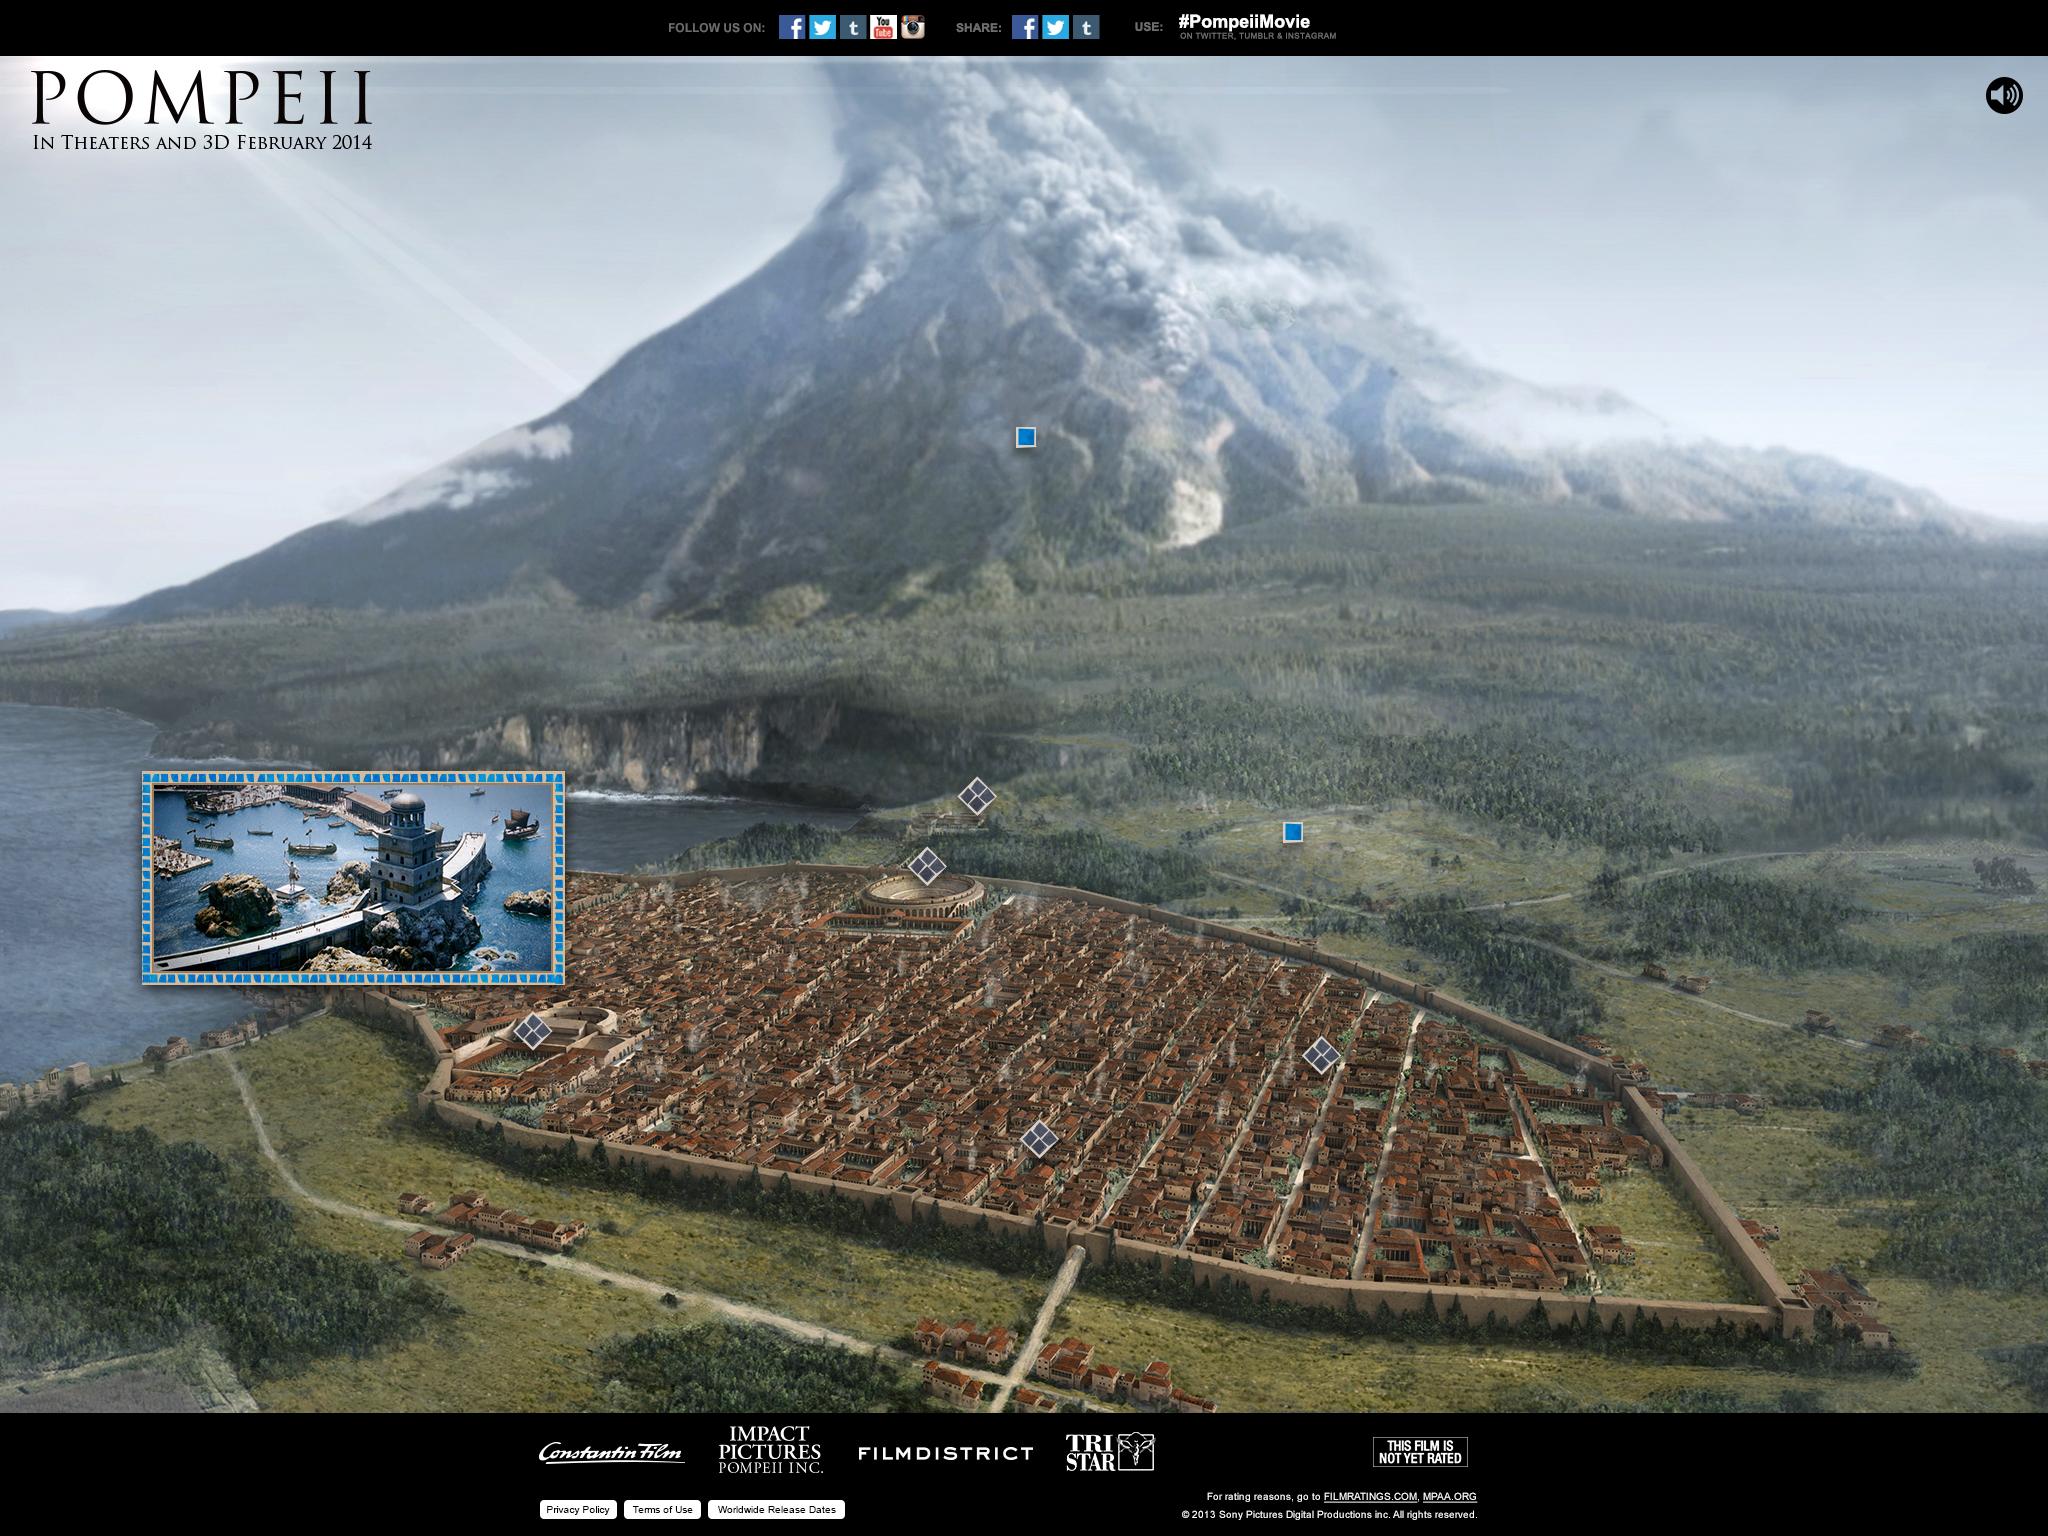 Pompeii_0008_harbor video.jpg